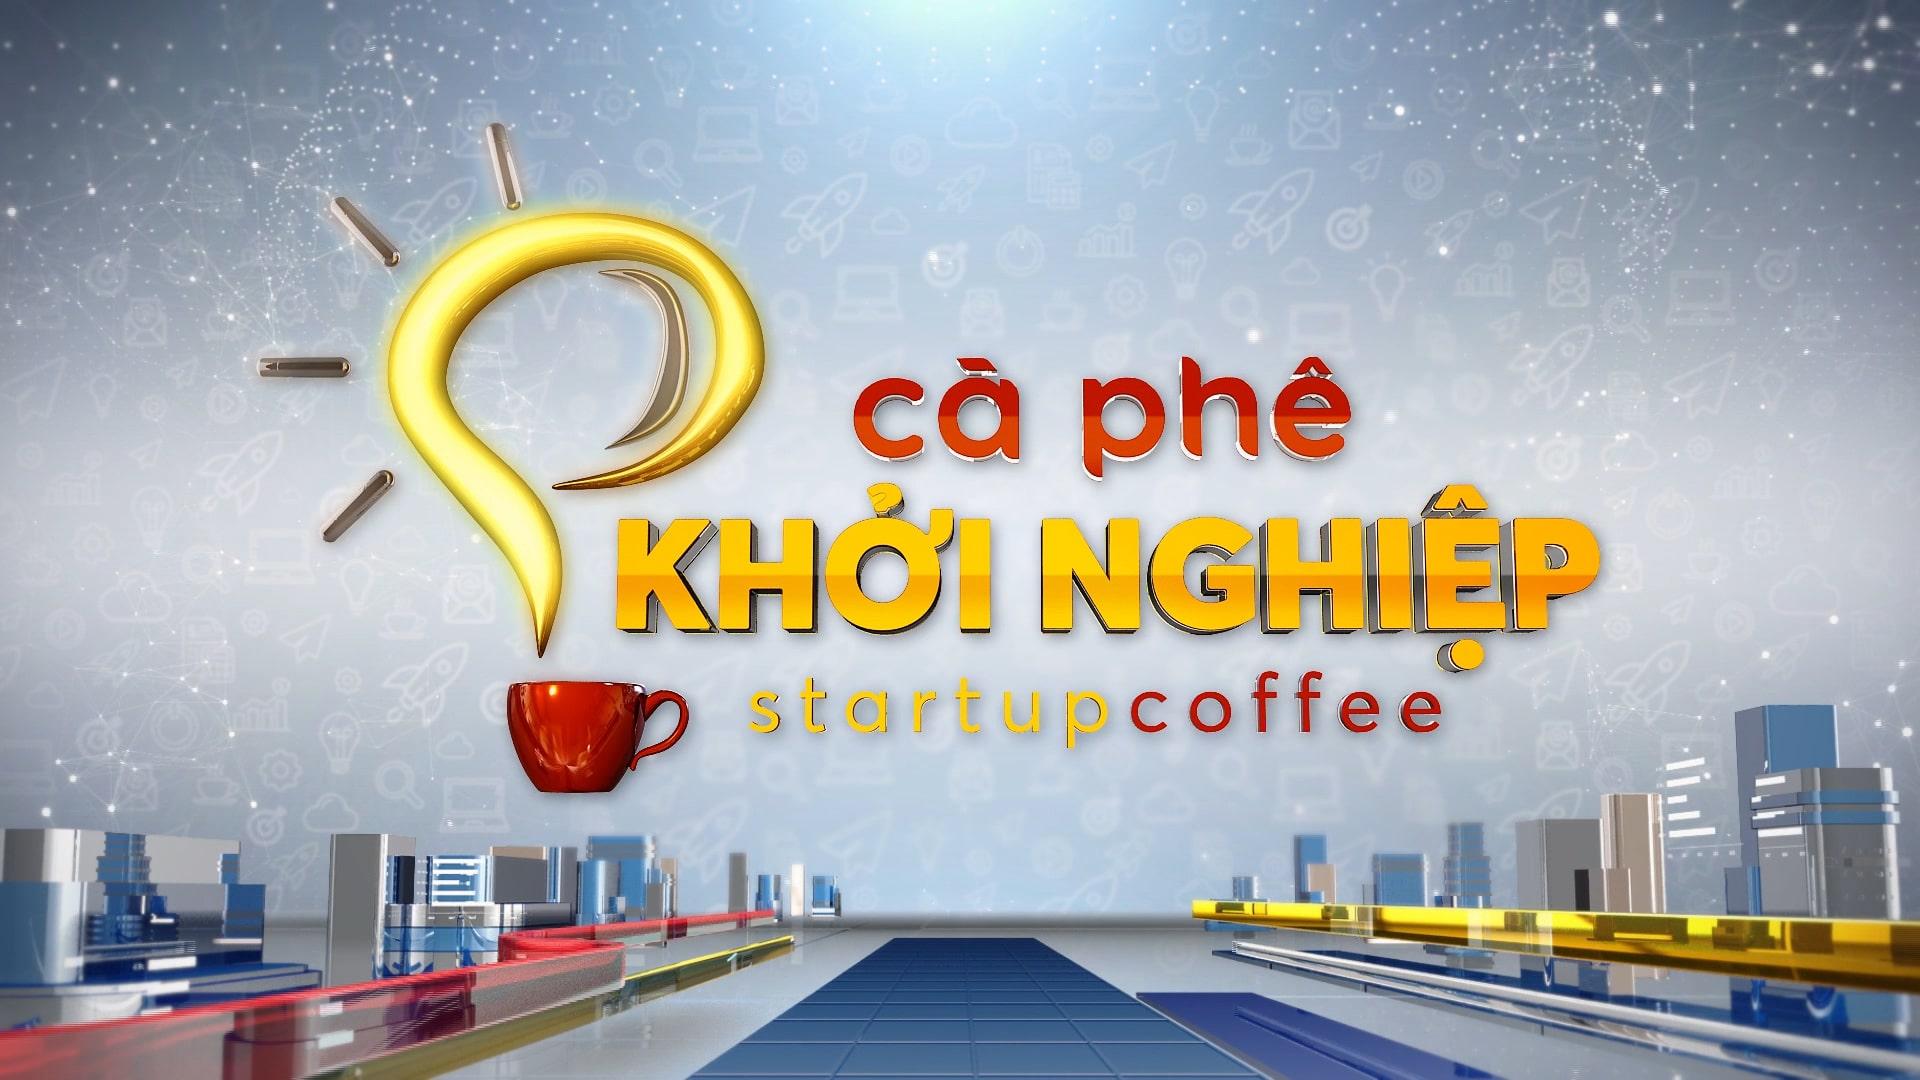 btaskee-ca-phe-khoi-nghiep-2018